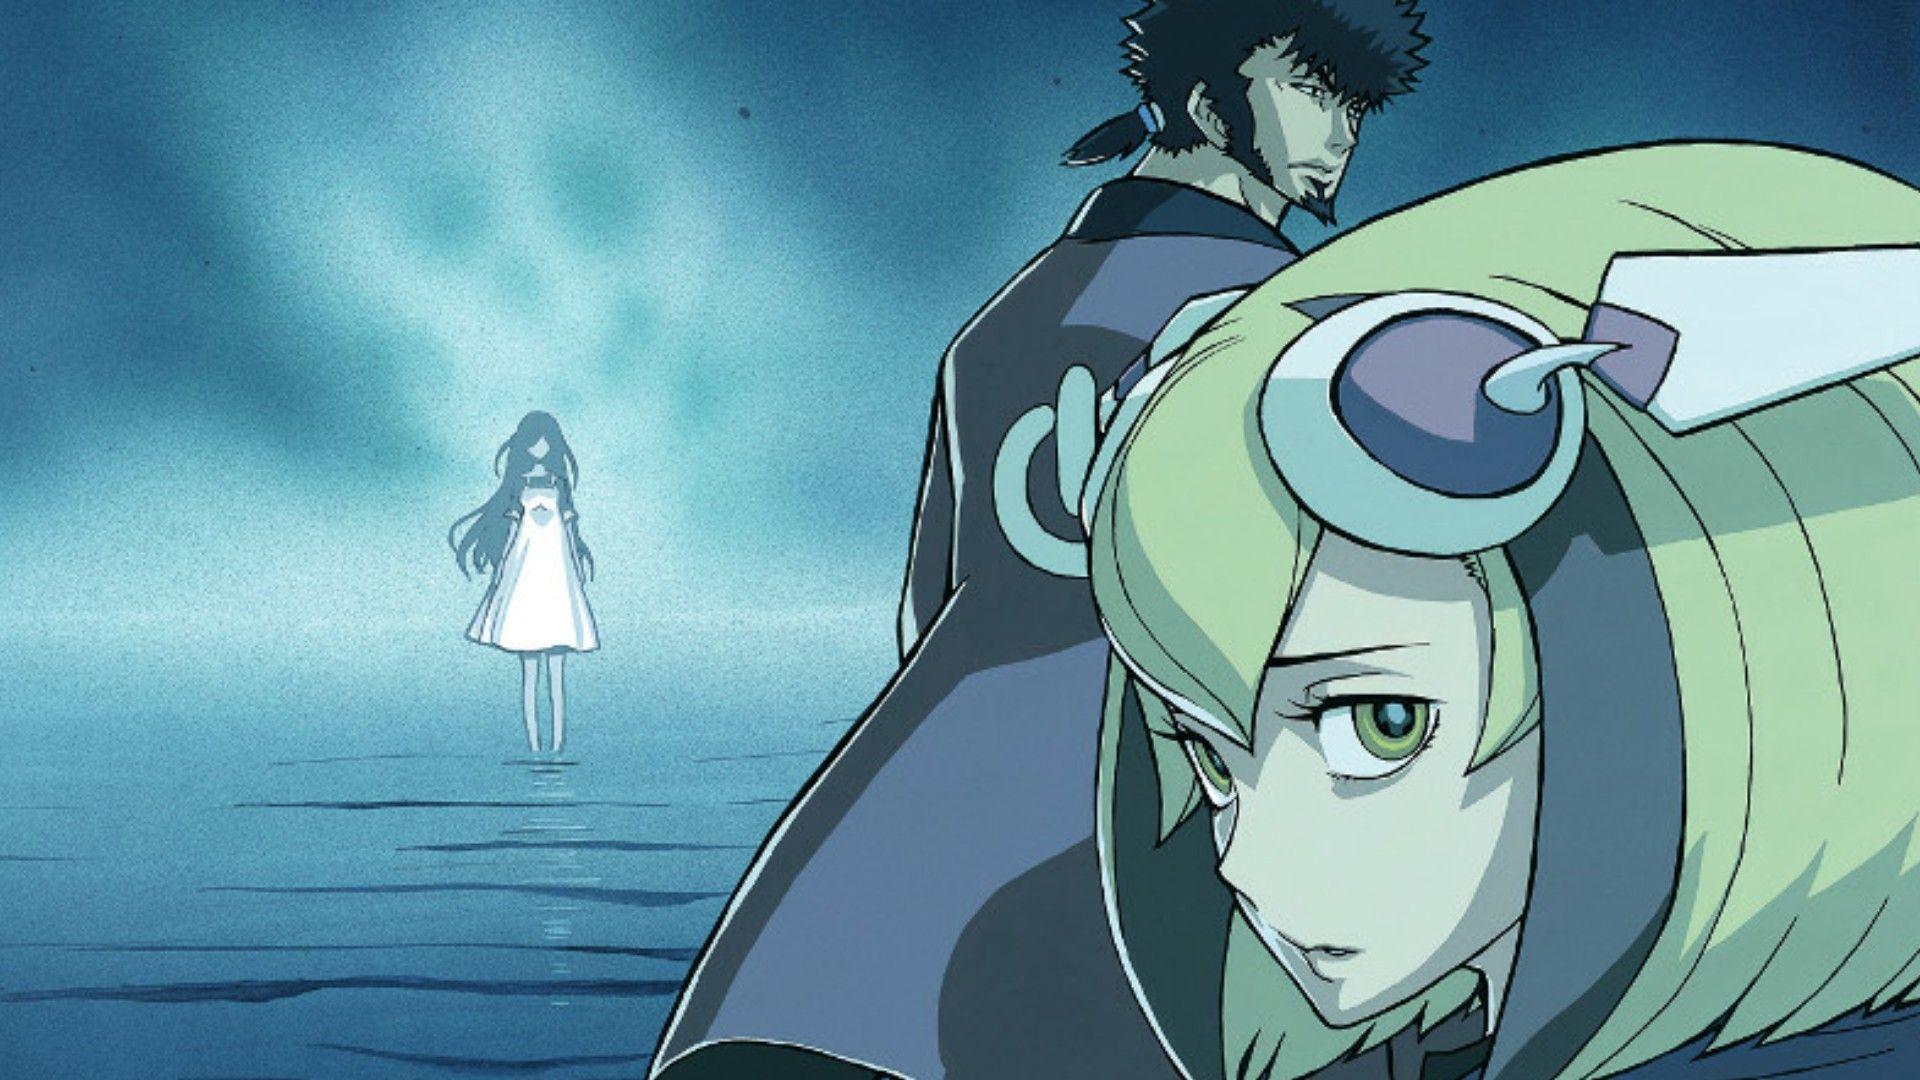 Dimension W Kyouma Mabuchi & Mira Yurizaki Anime